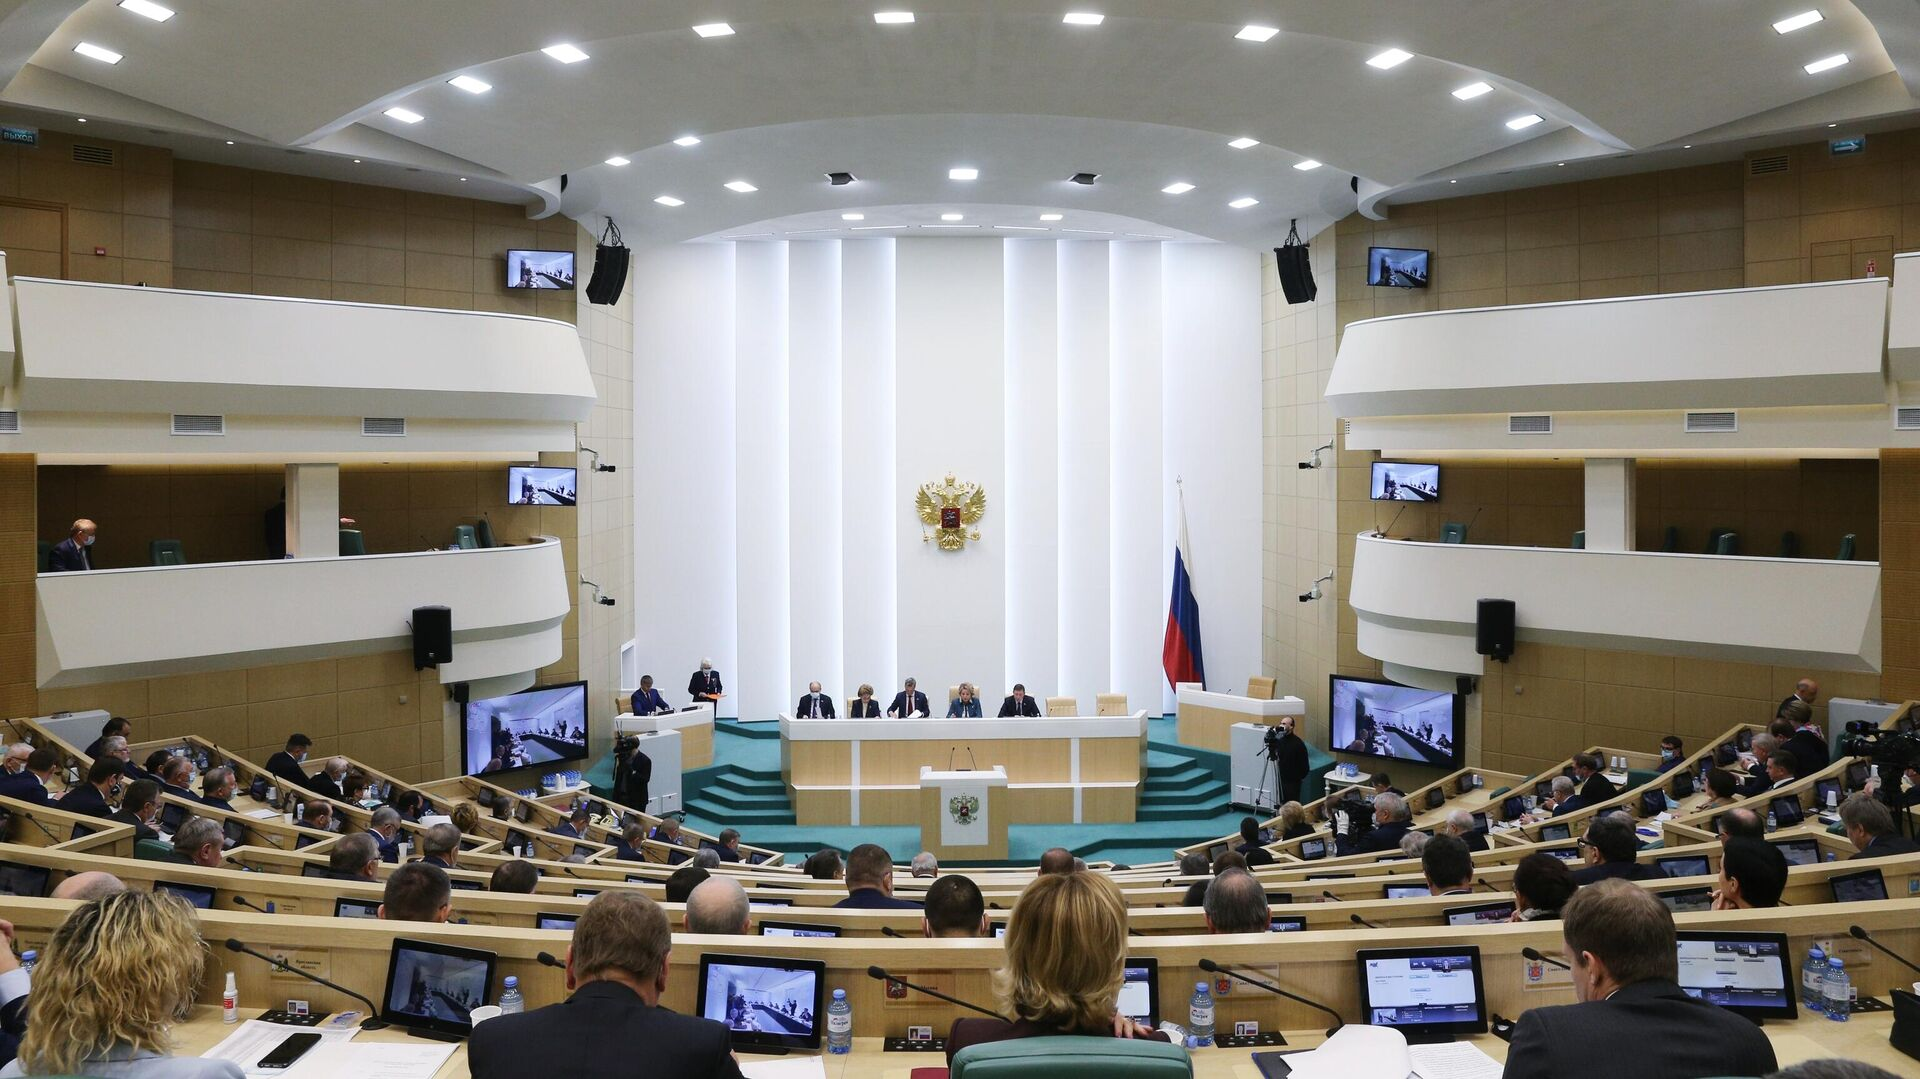 Заседание Совета Федерации РФ - РИА Новости, 1920, 02.12.2020